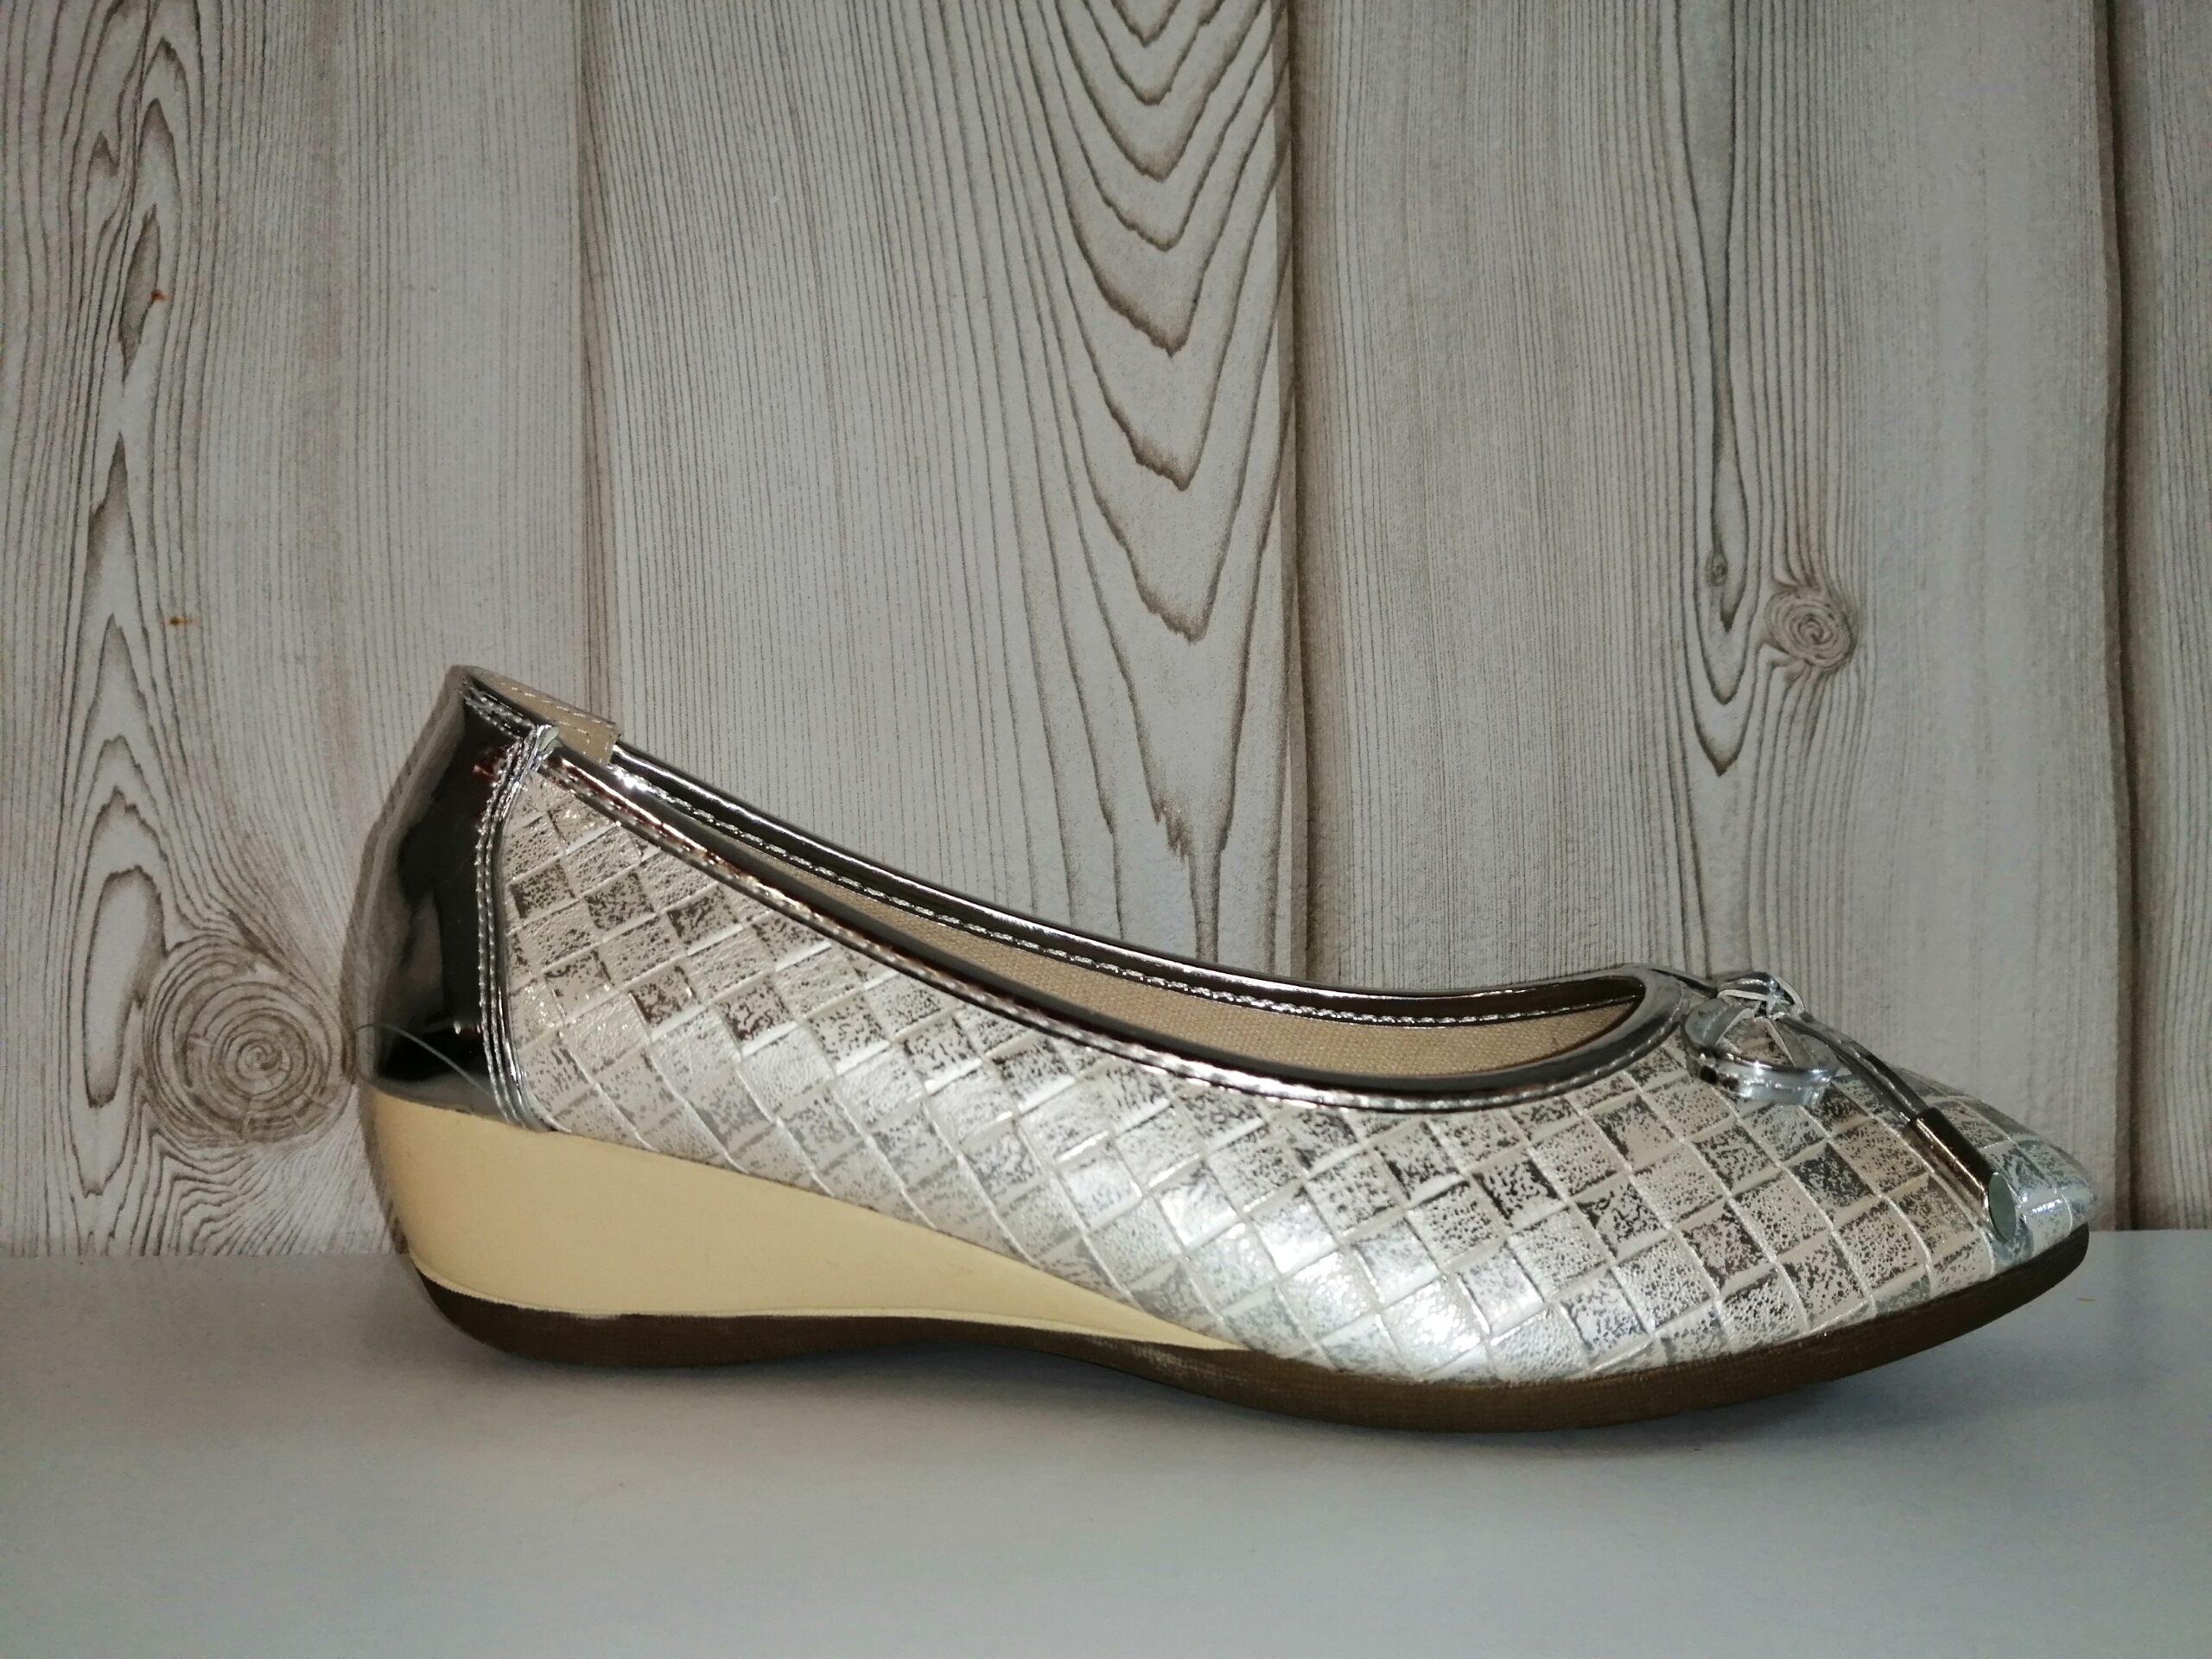 Bailarina cuña plata / marino 1273 Crube